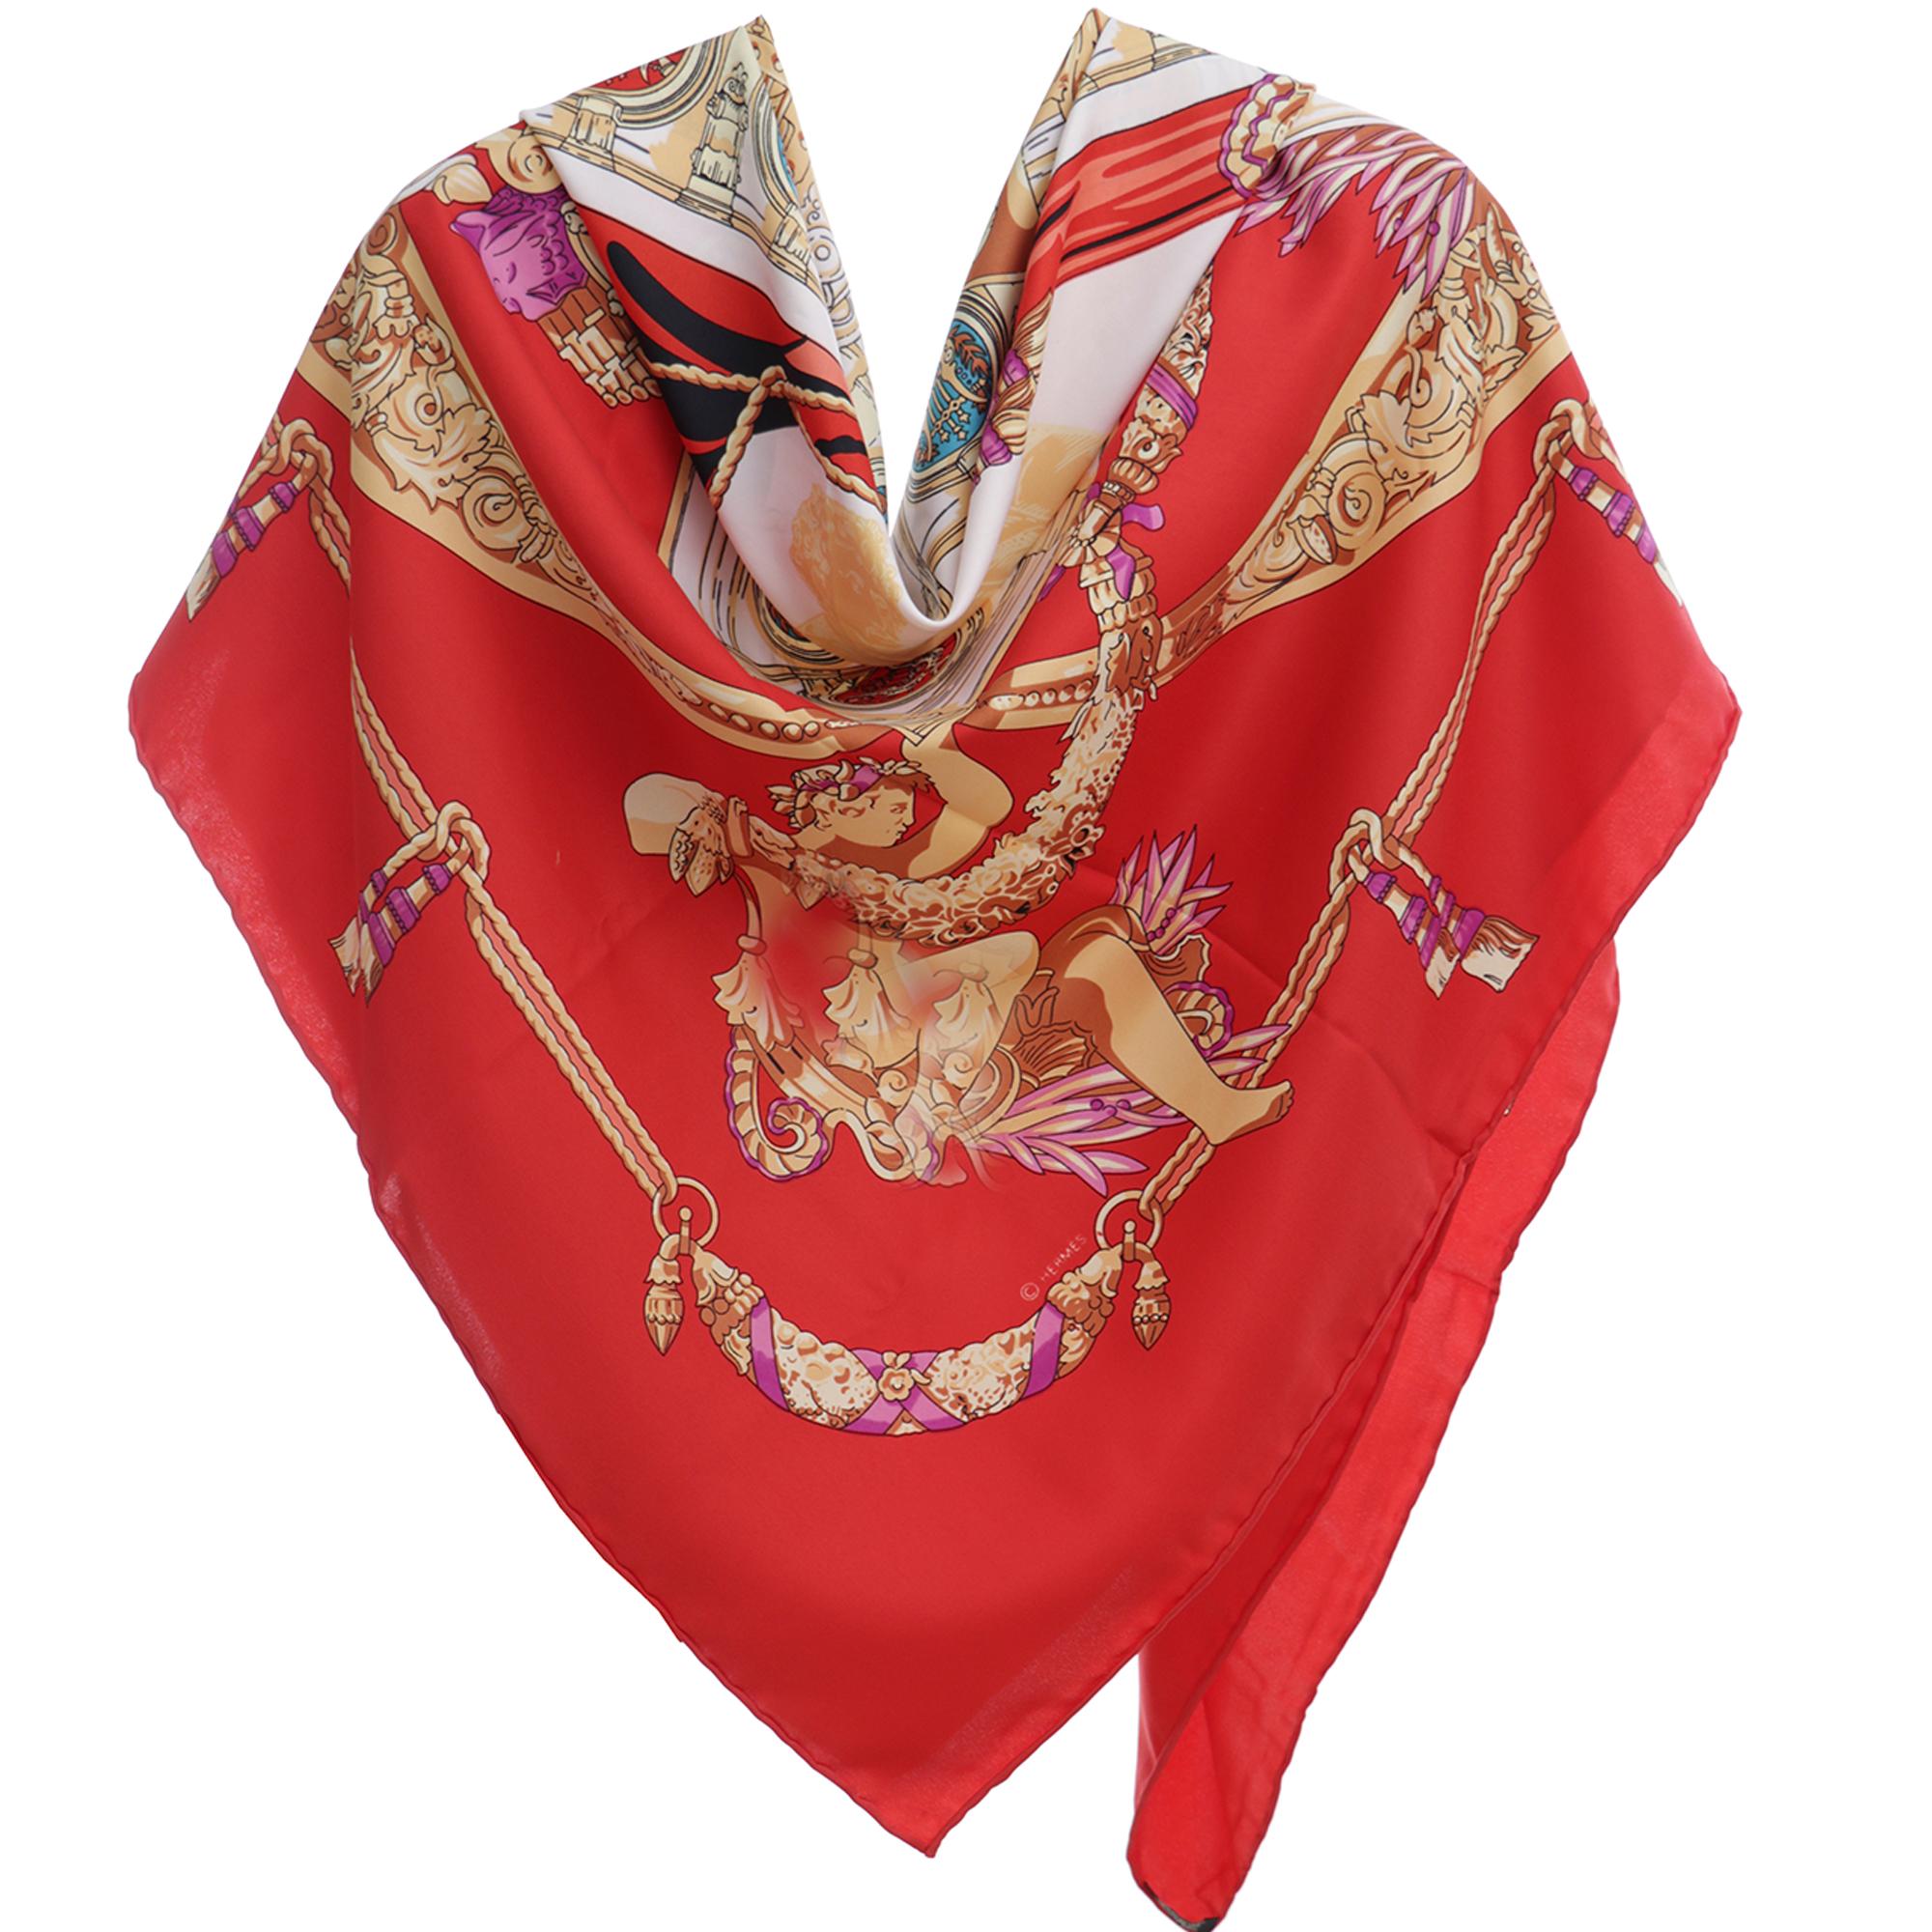 قیمت روسری توییل کد tp-975